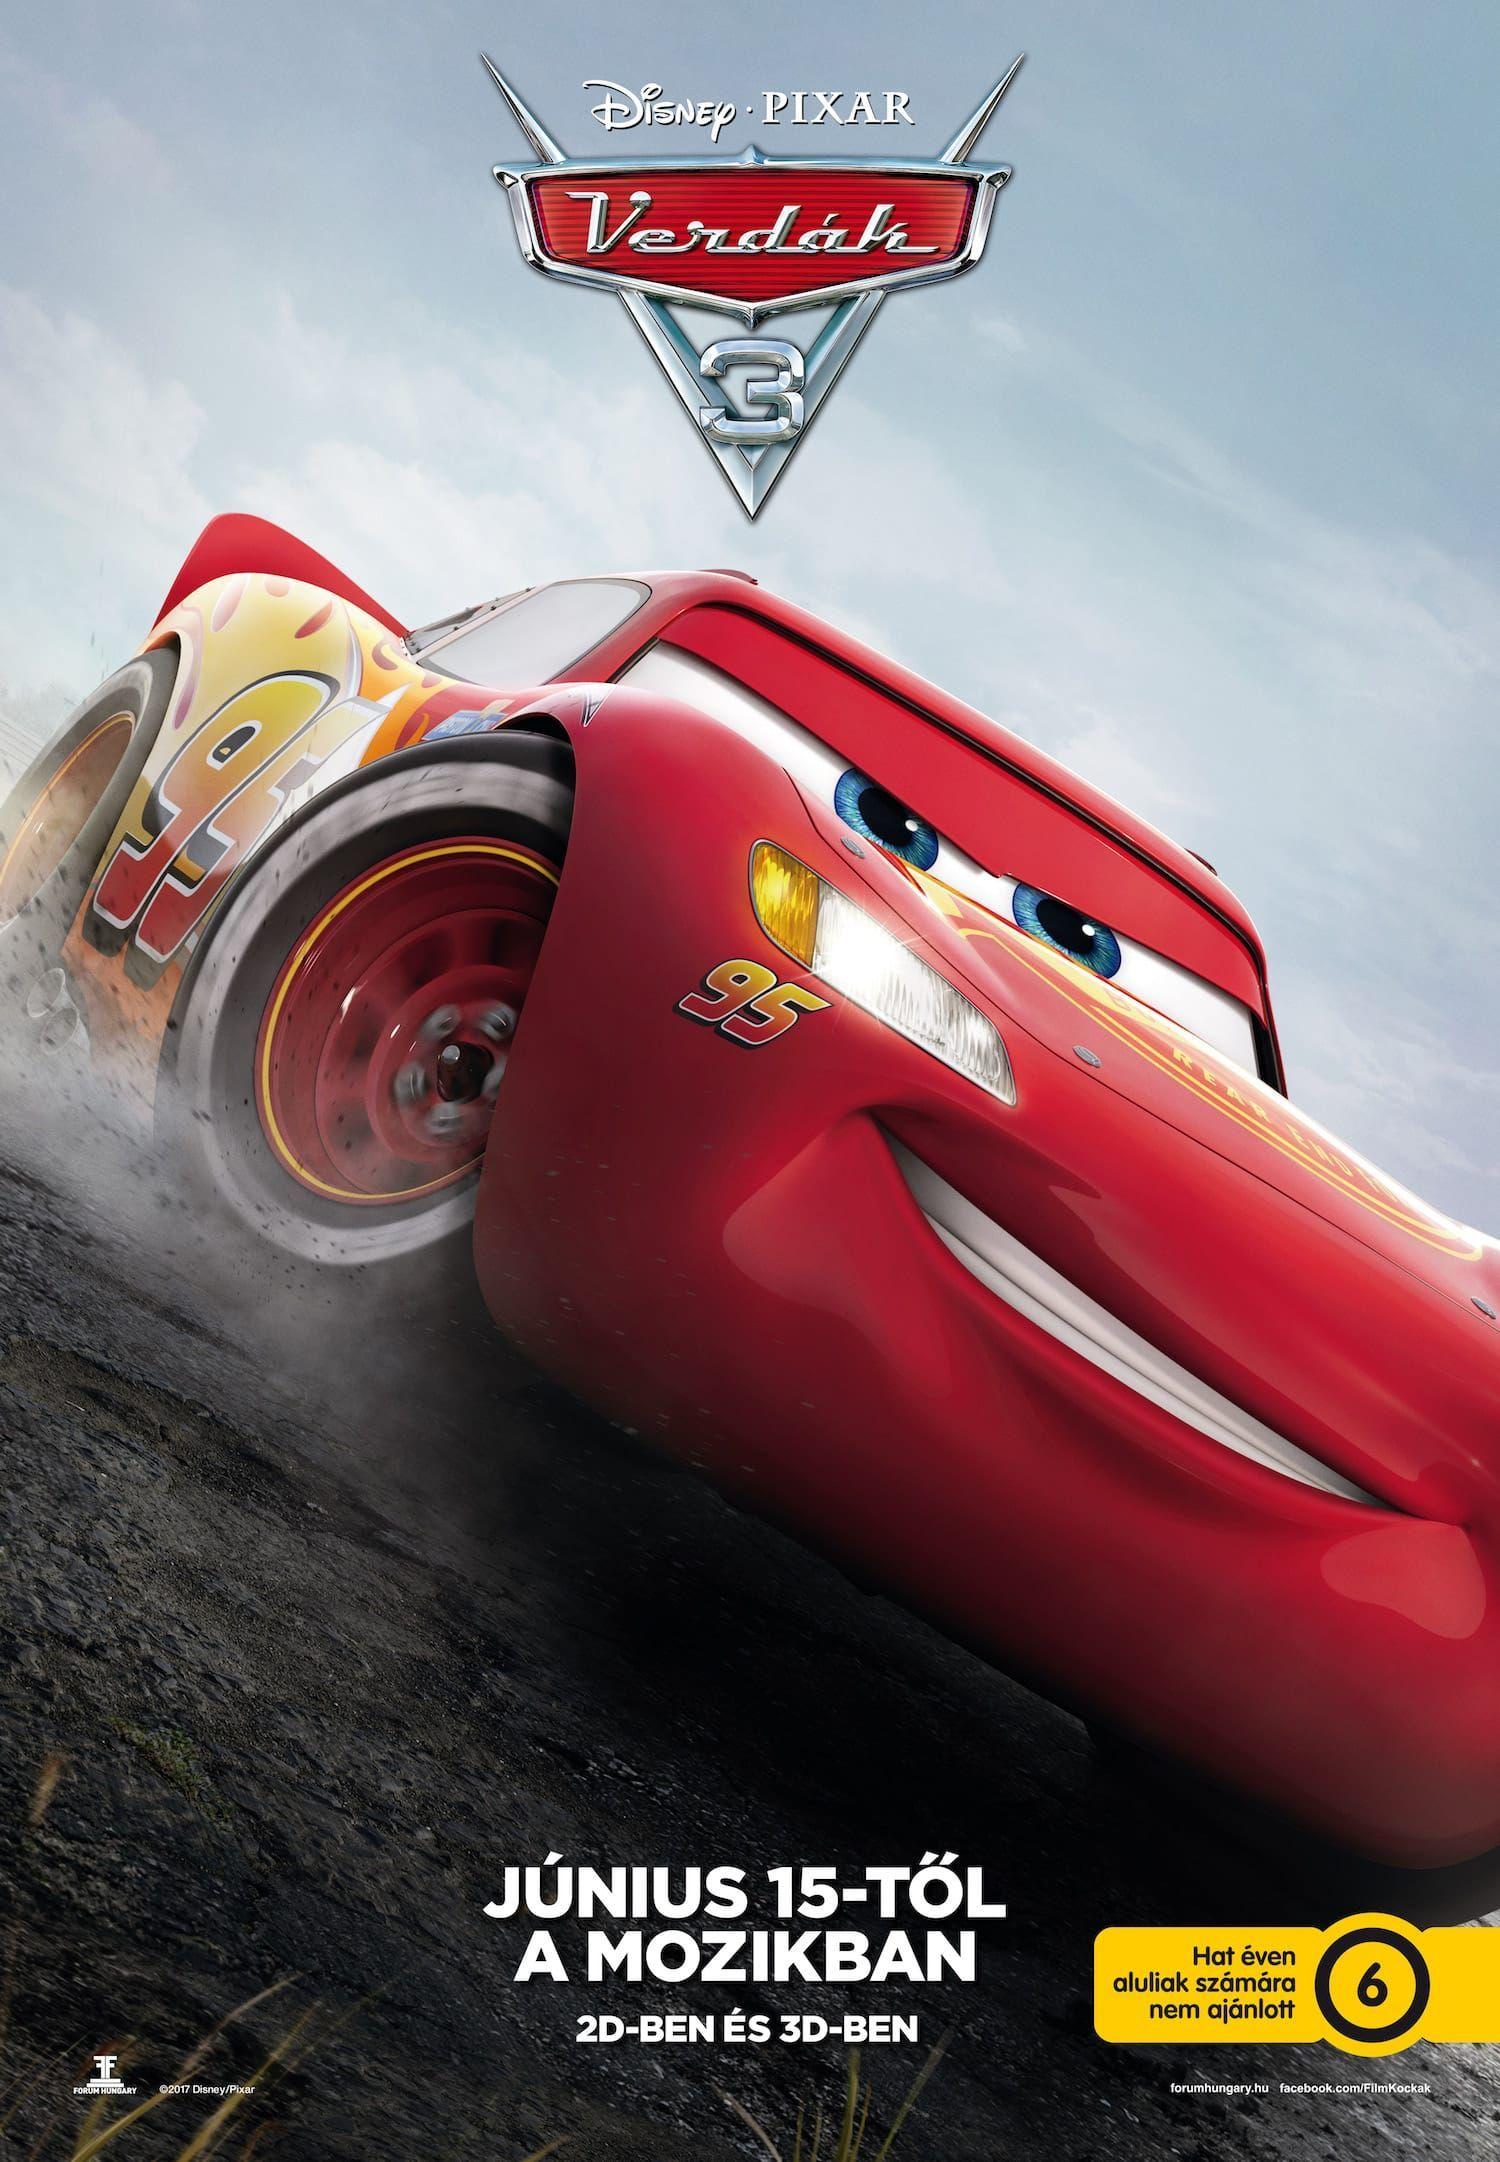 Verdak 3 Cars 3 2017 Mafab Hu